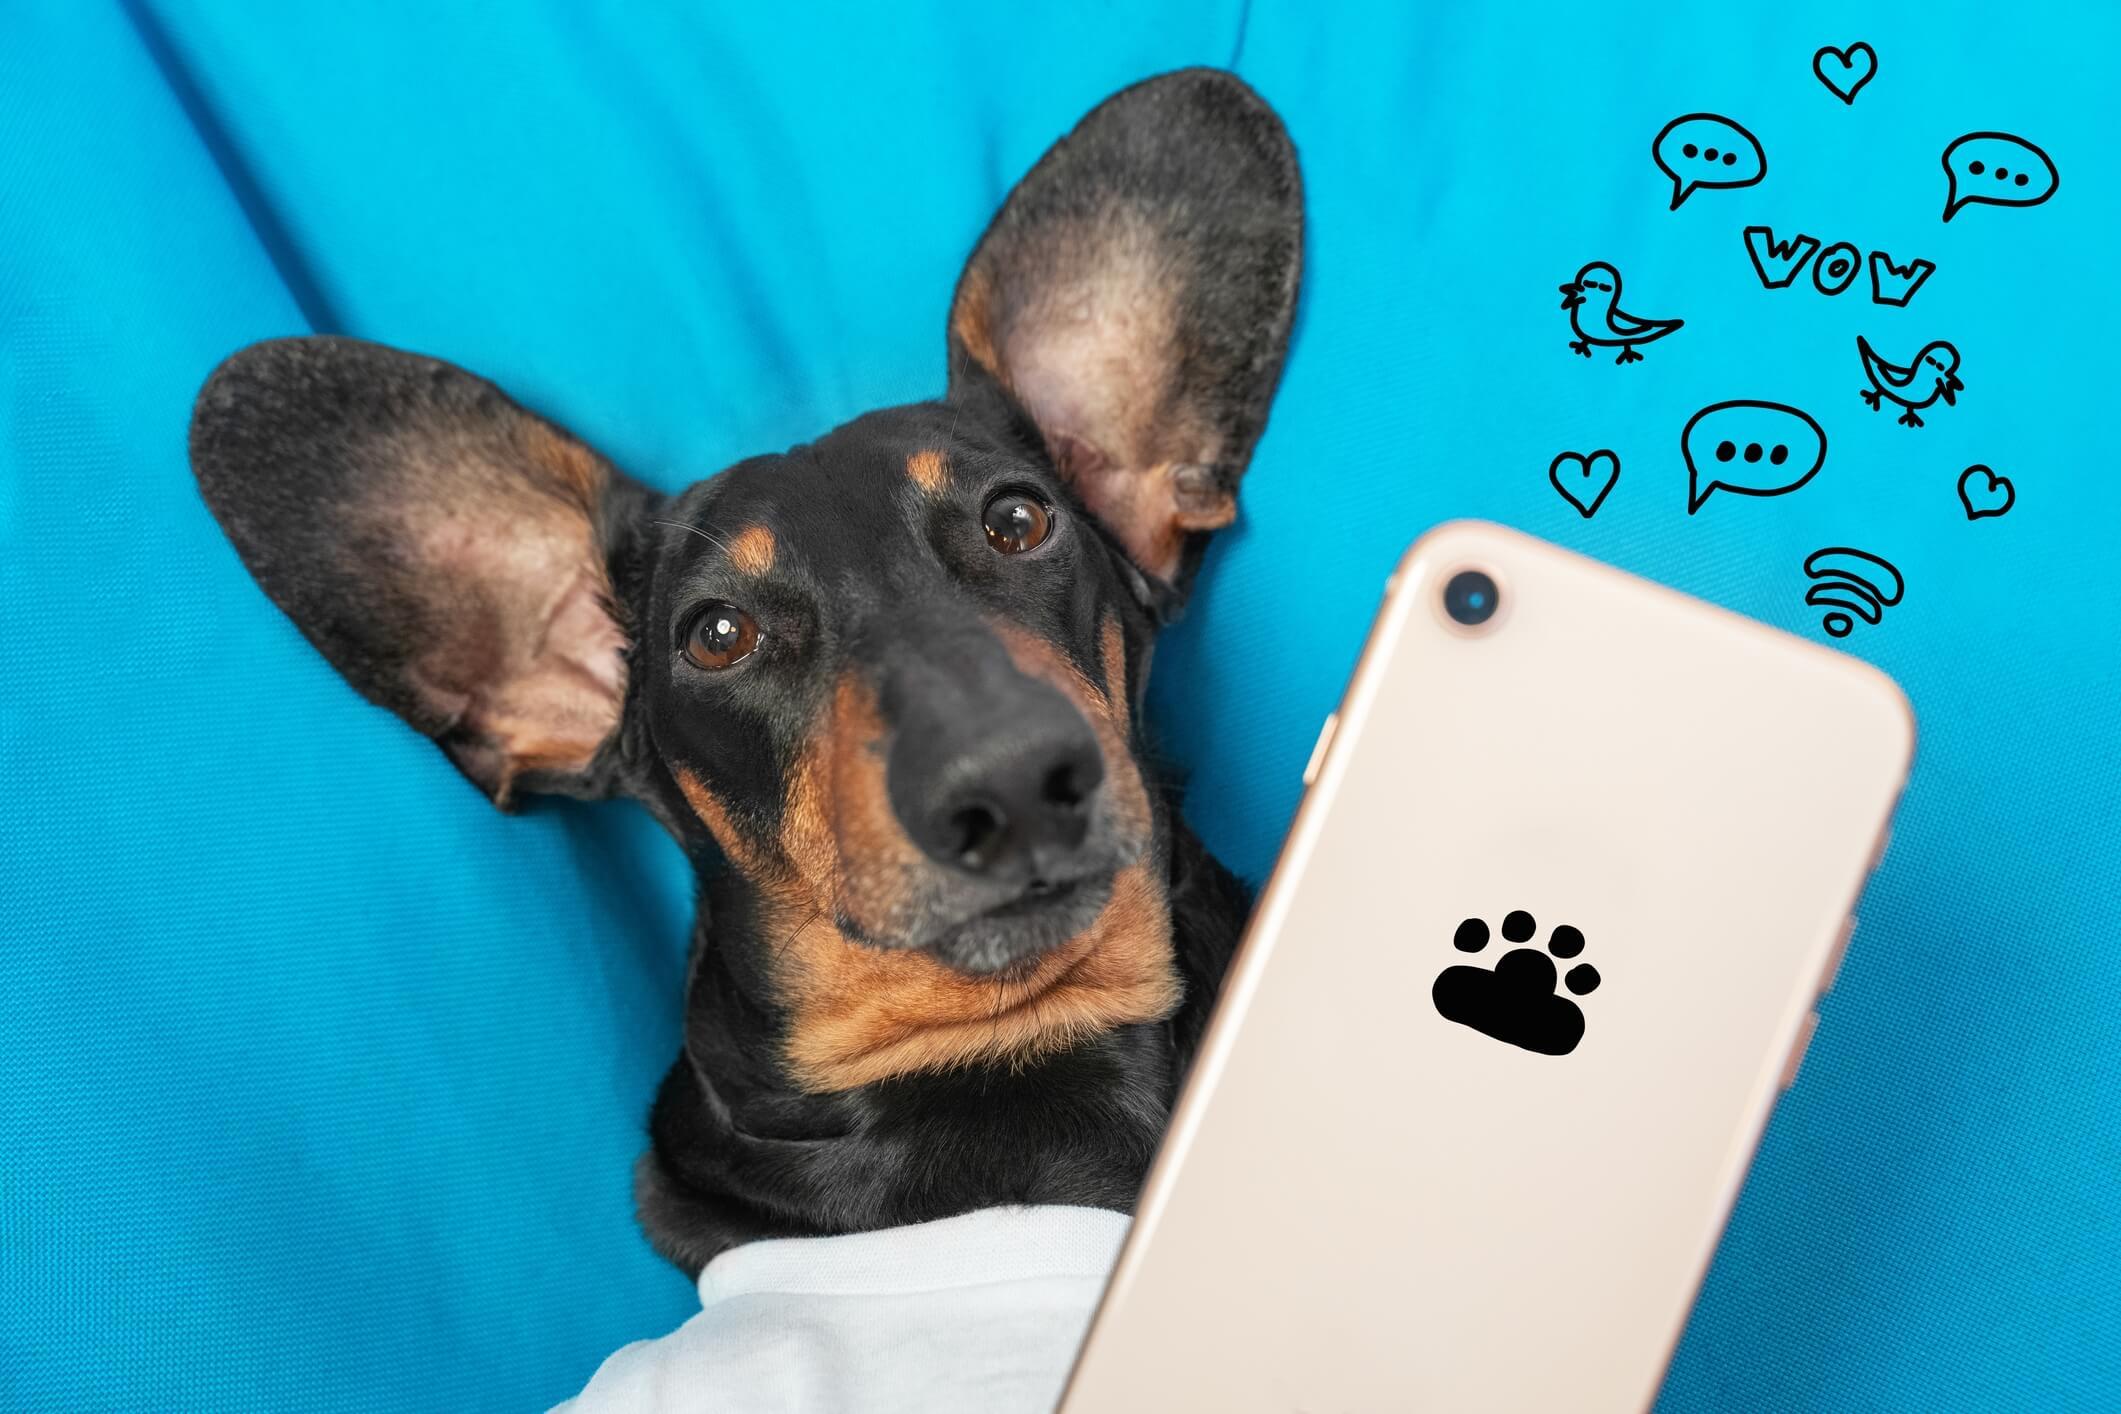 a cute dog holds a smartphone